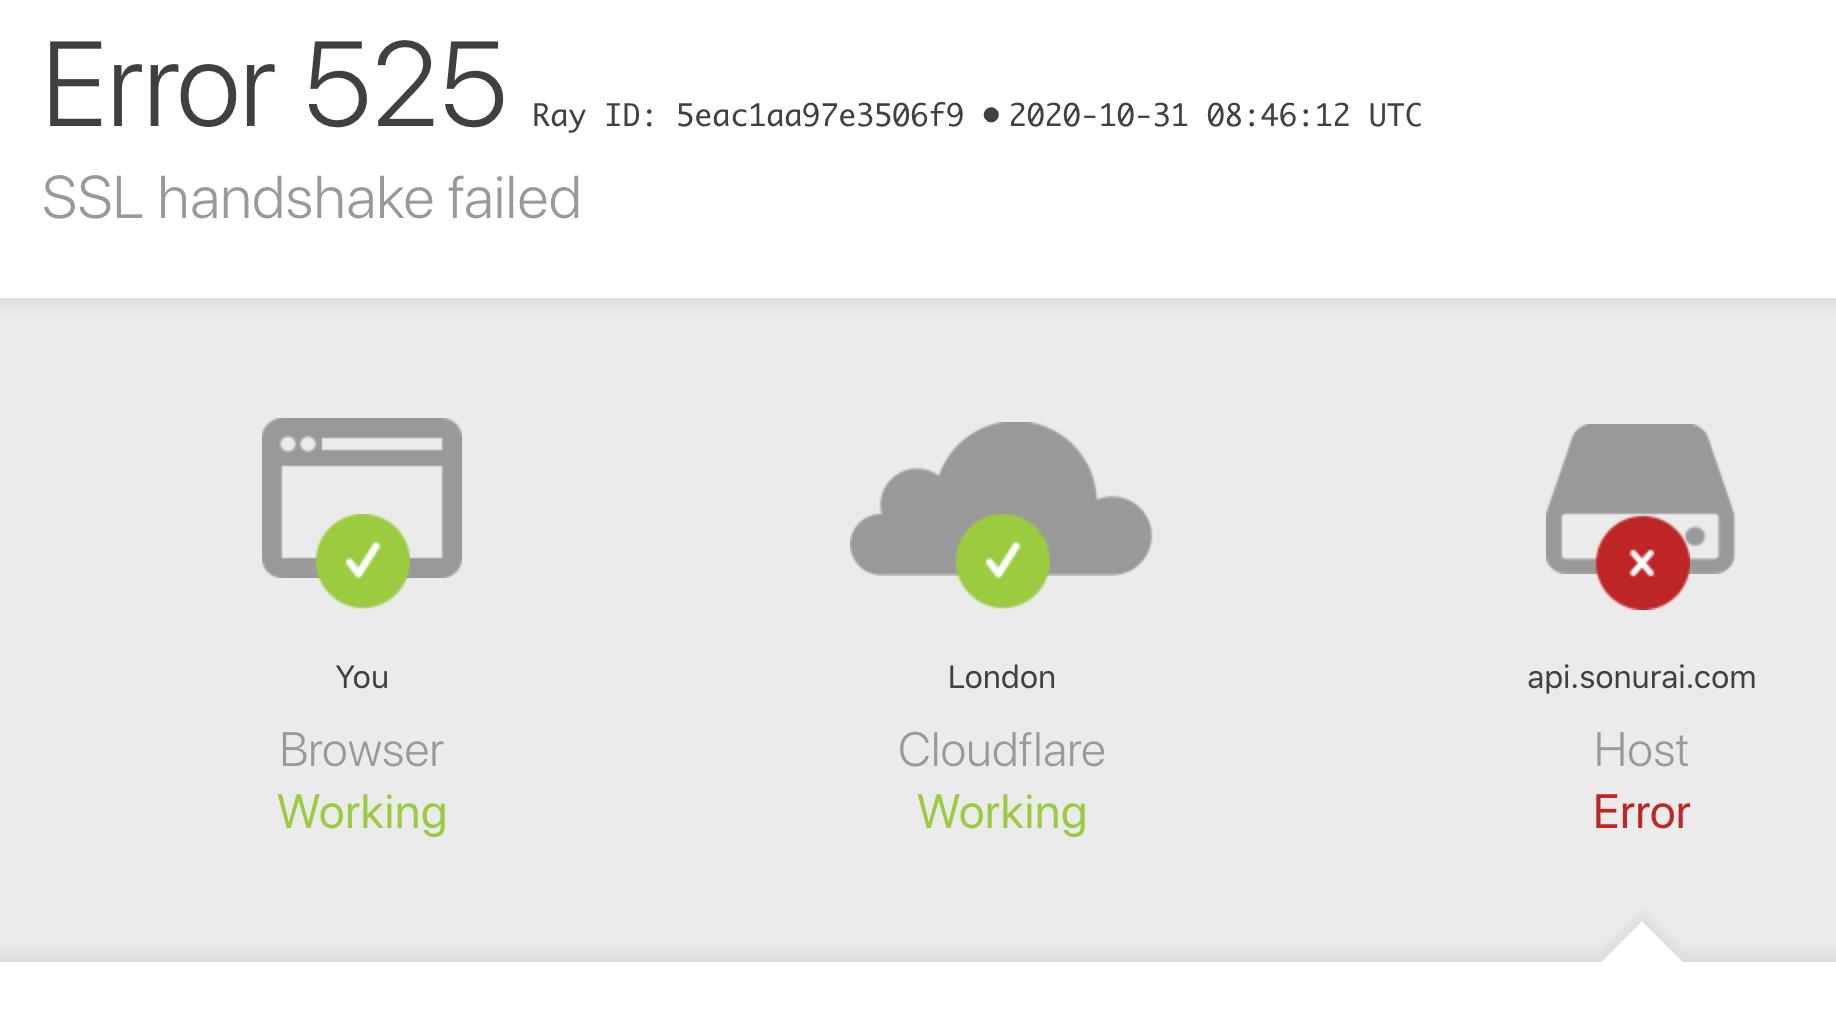 Error 525 - SSL handshake failed